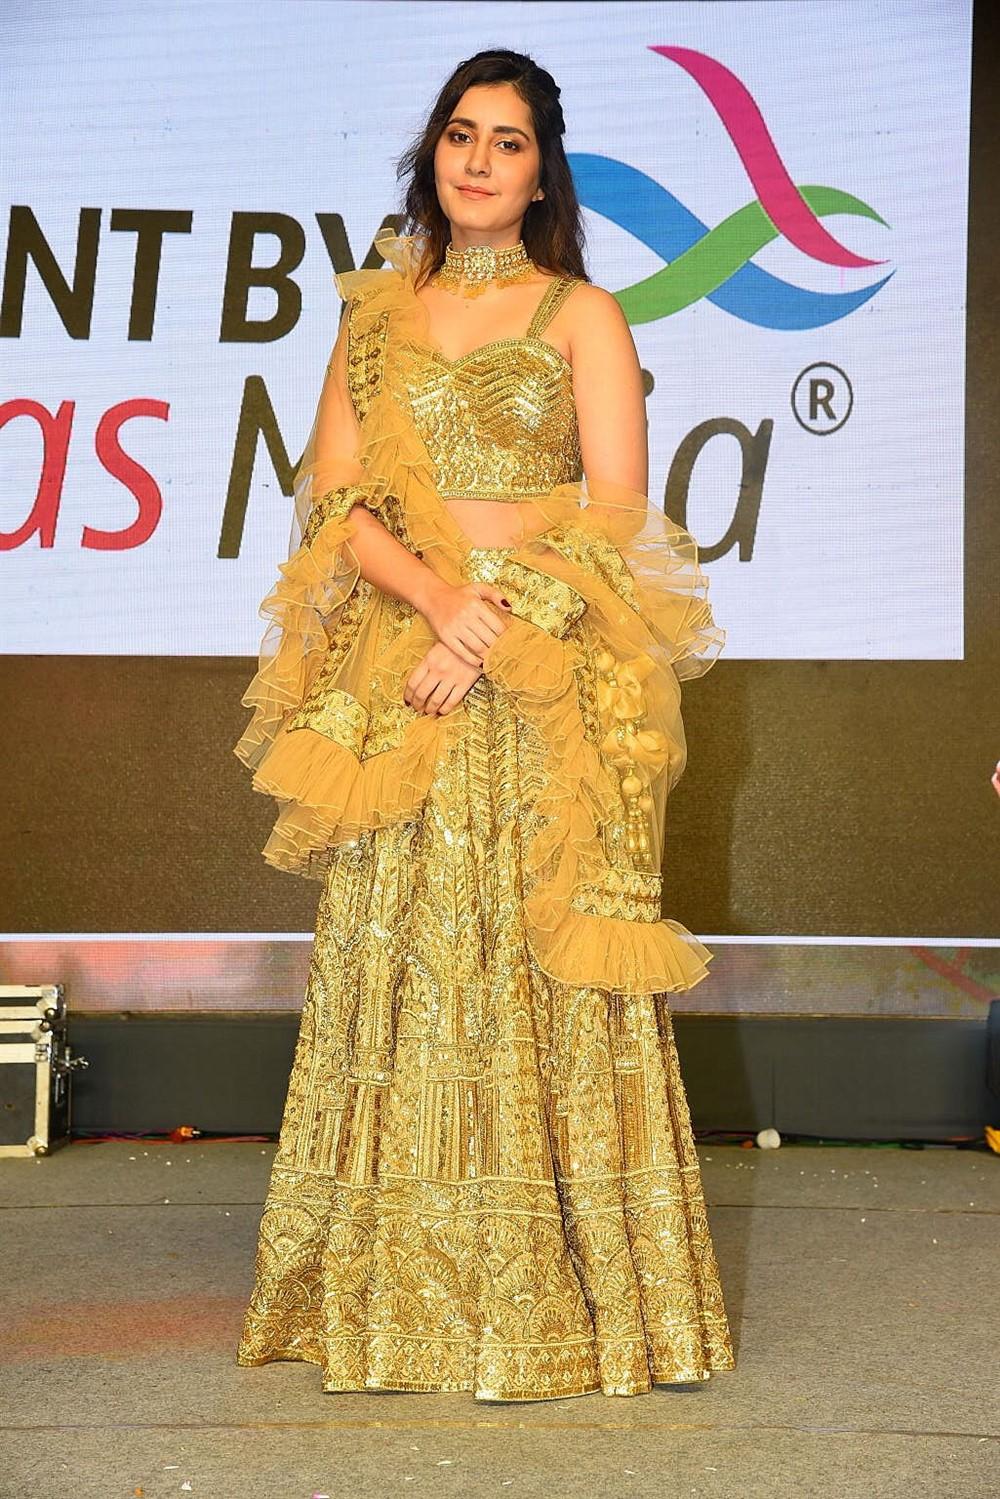 Venky Mama Movie Actress Raashi Khanna New Images